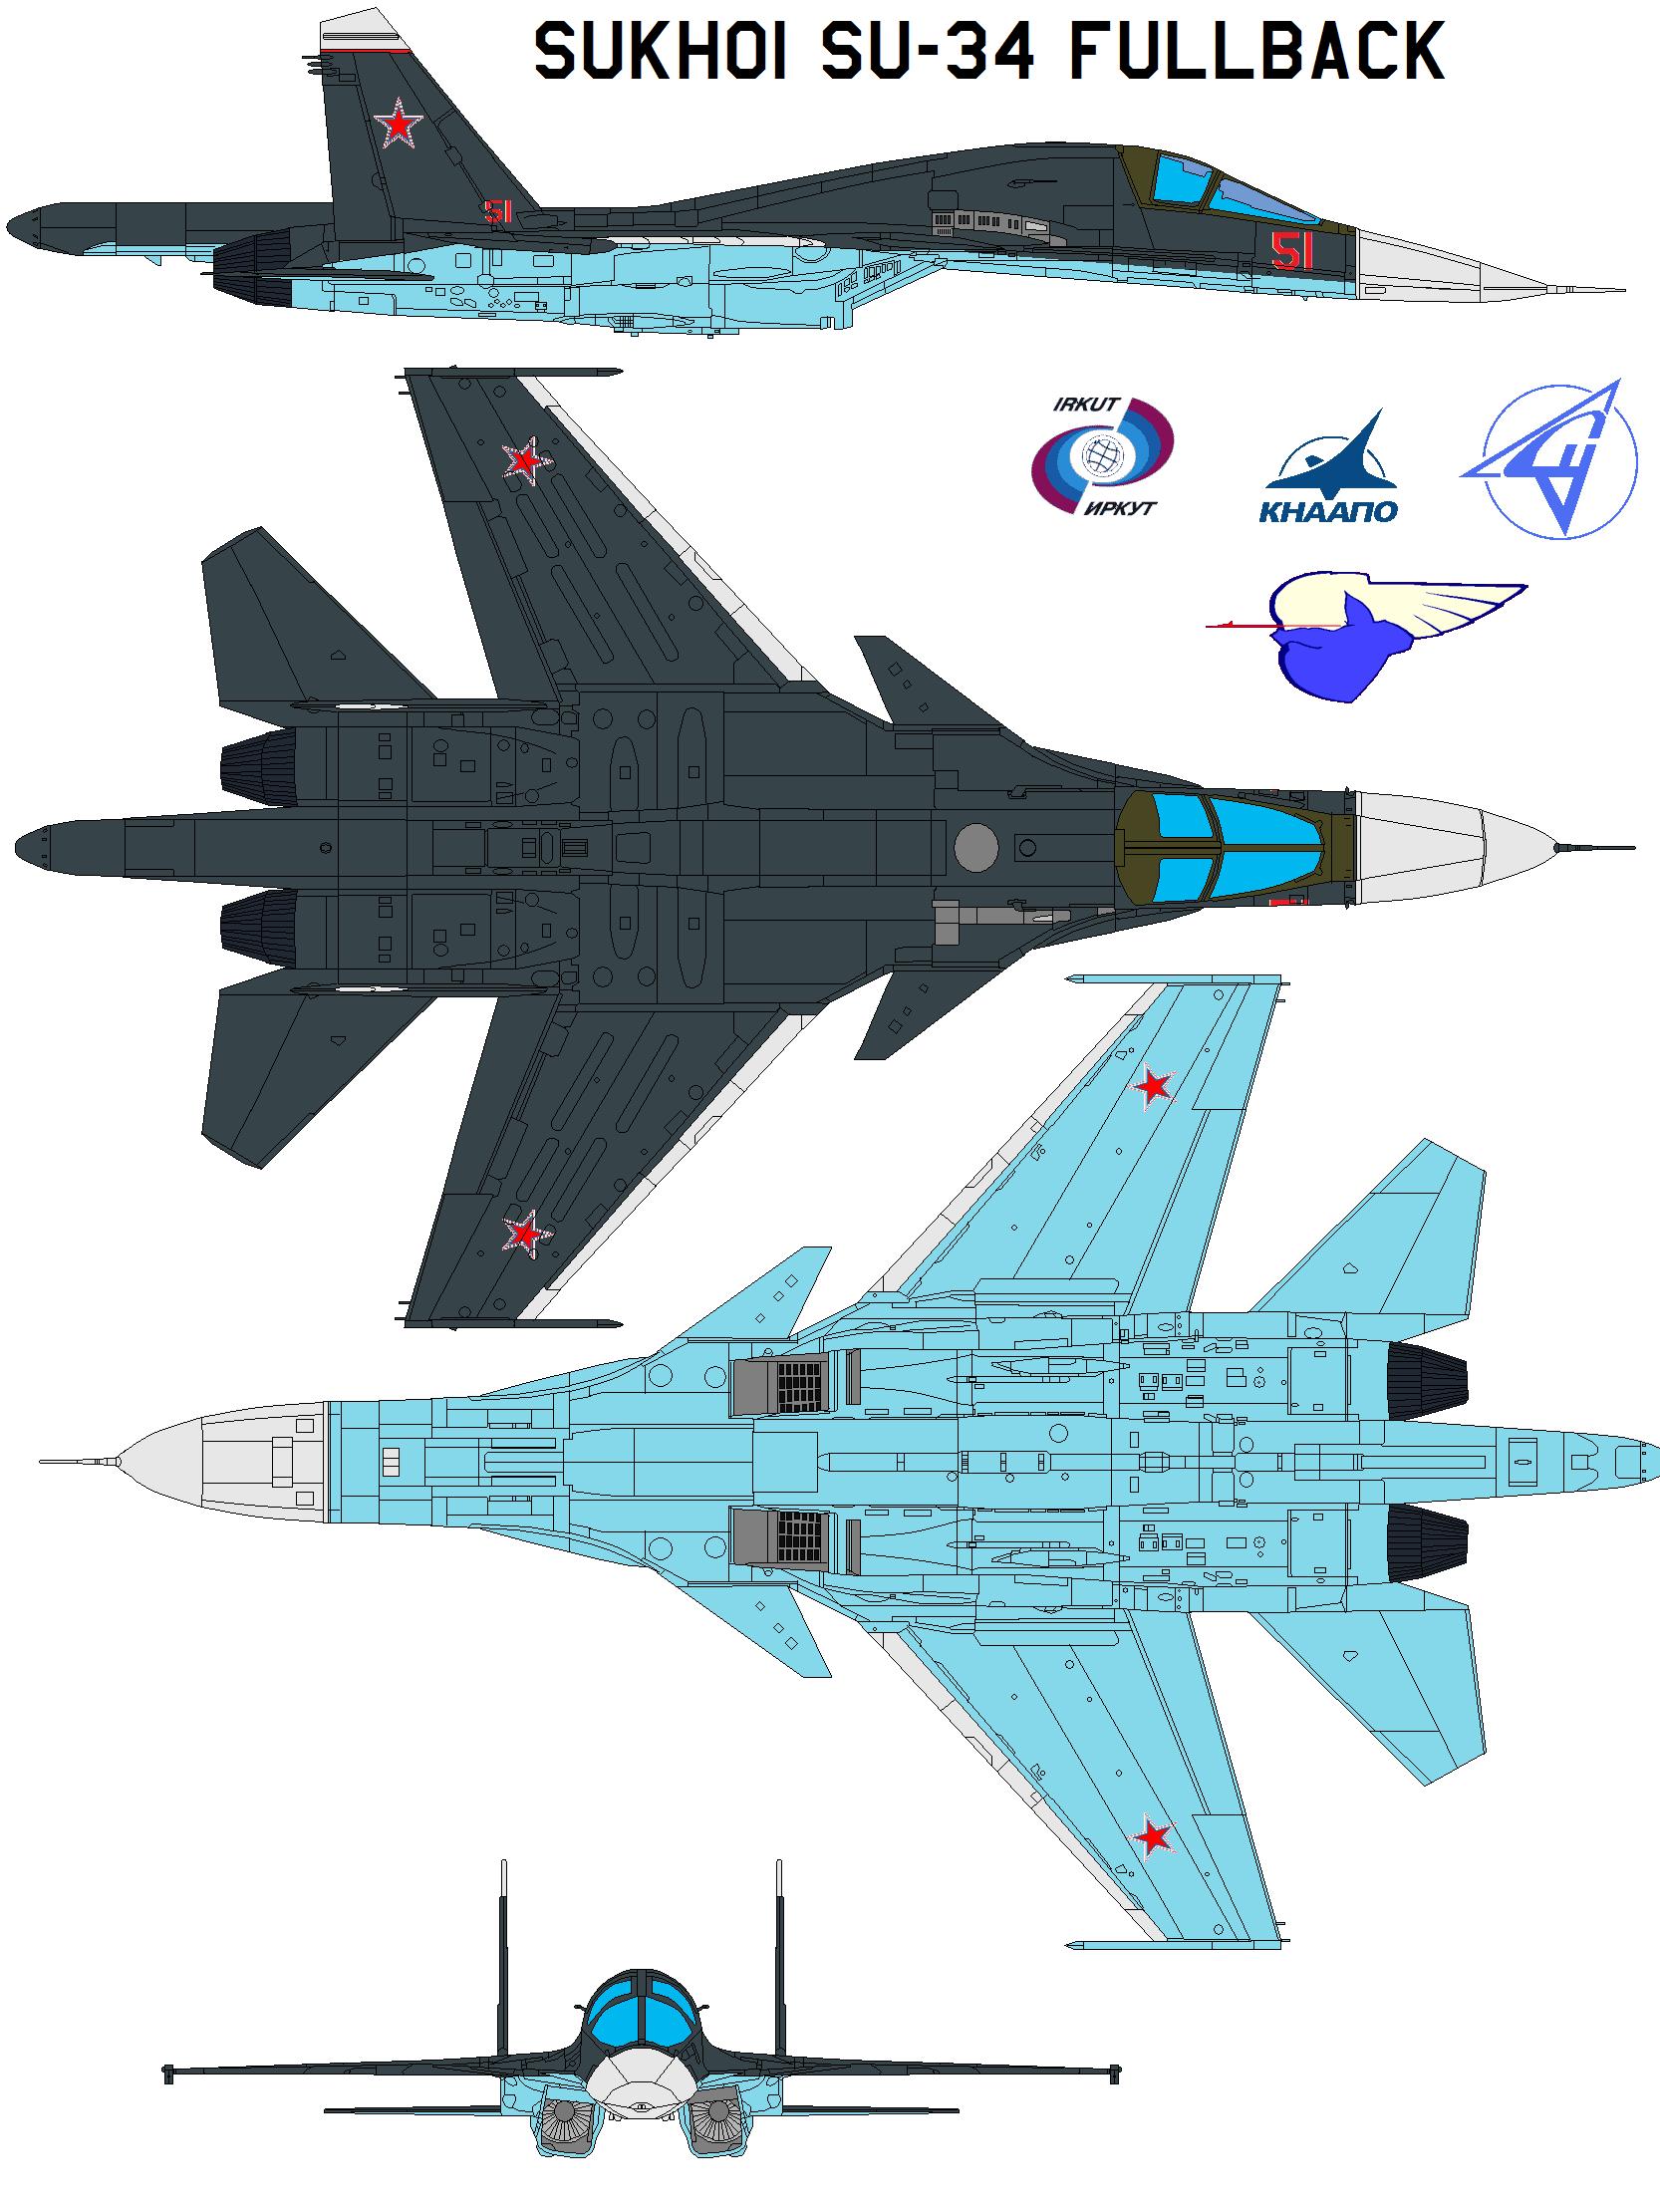 Sukhoi Su-34 Fullback north by bagera3005 on DeviantArt